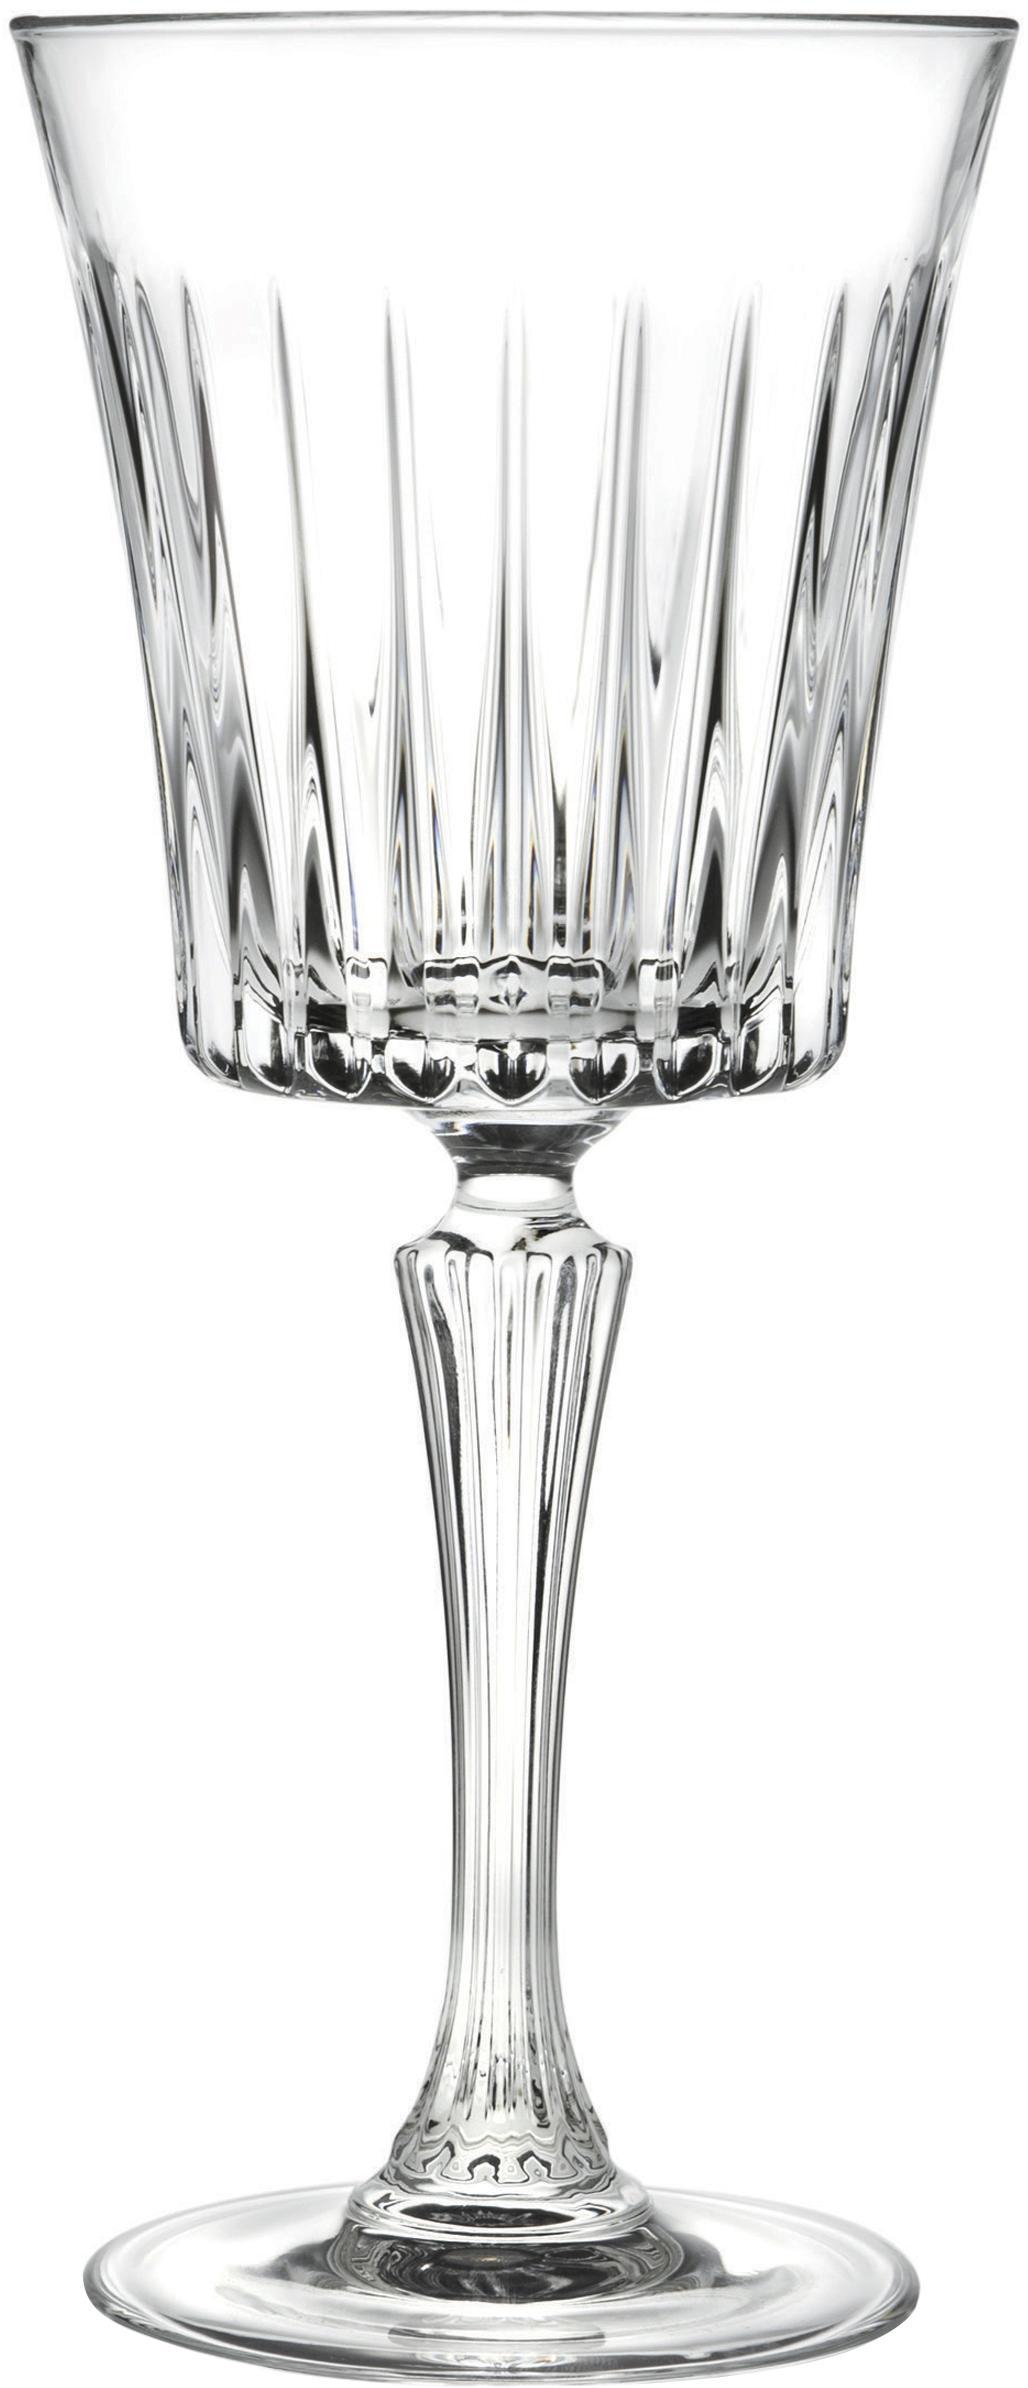 Copas de vino blanco de cristal Timeless, 6uds., Cristal, Transparente, Ø 8 x Al 20 cm